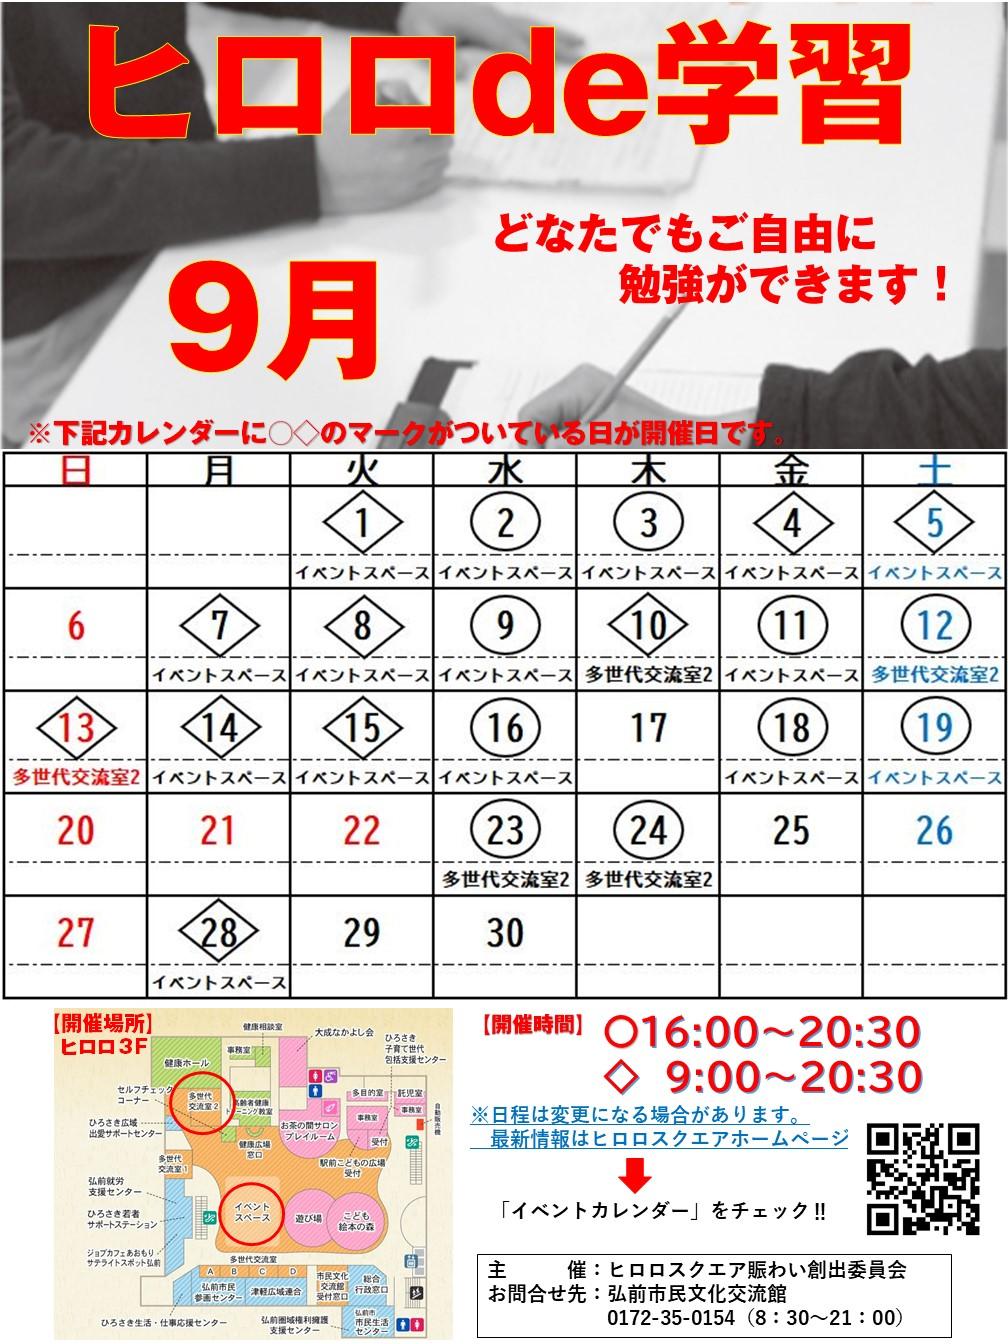 「ヒロロde学習」9月分日程